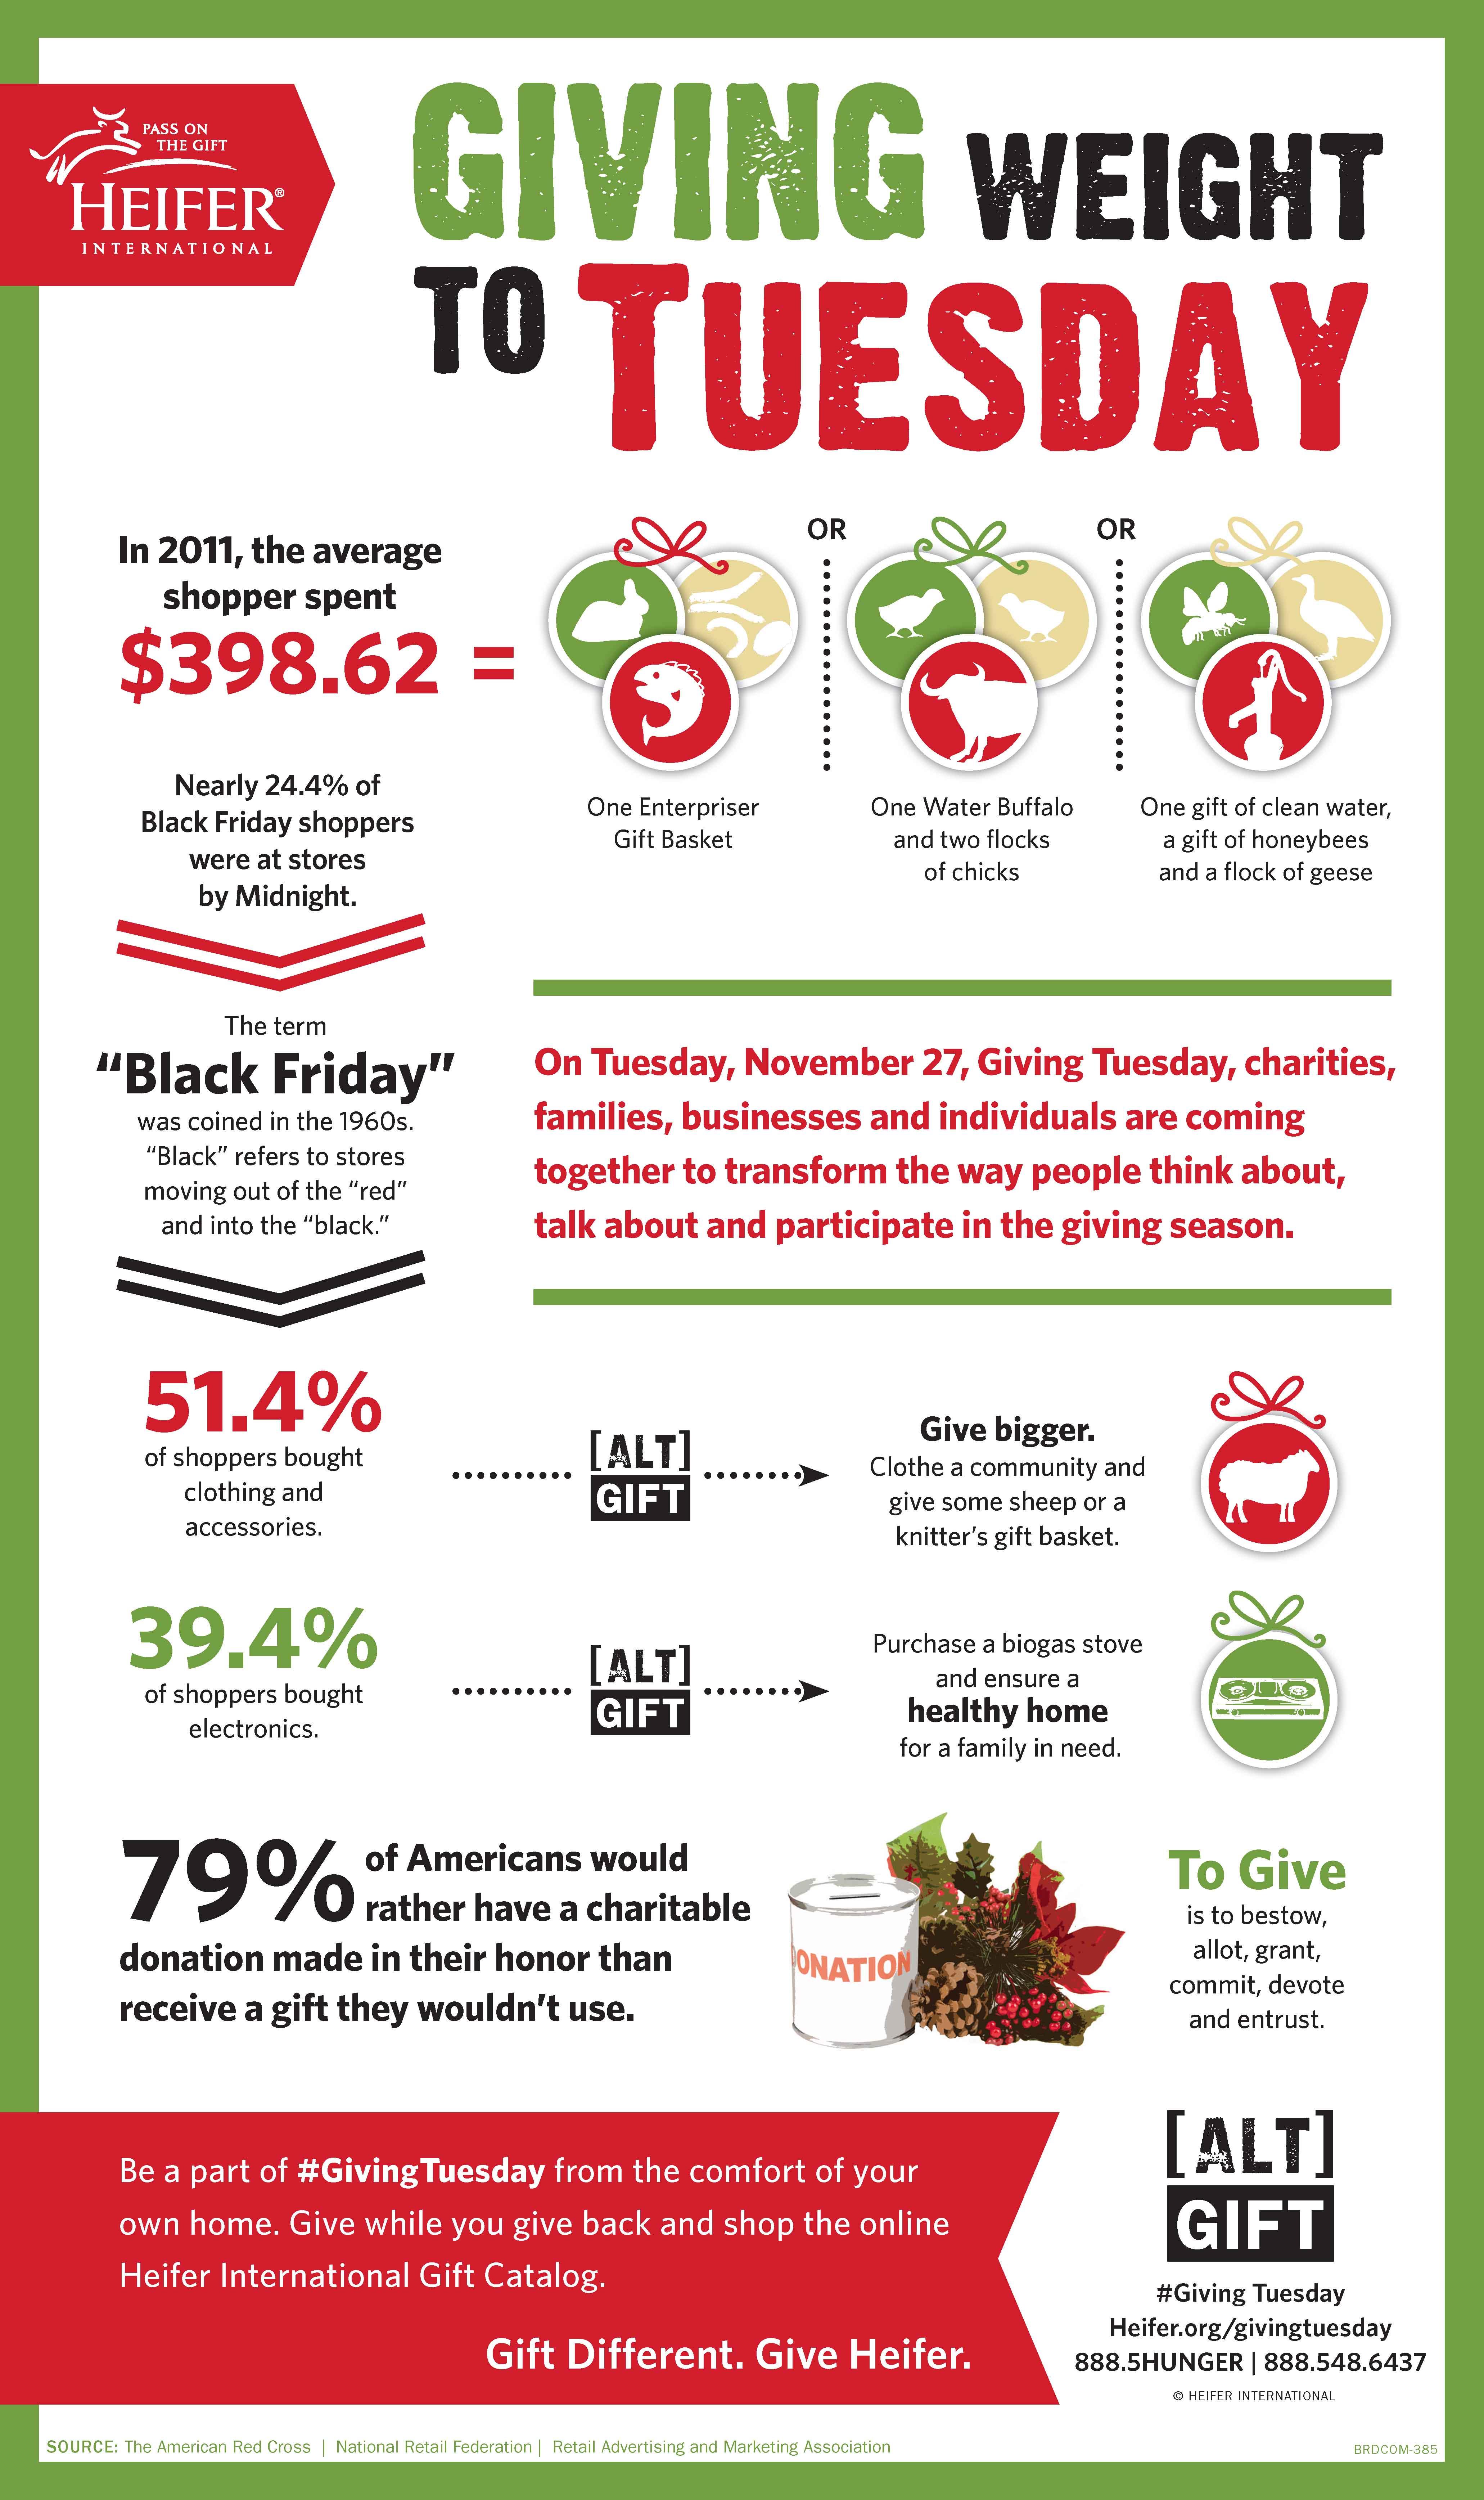 2012-11-19-BRDCOM385GivingTuesdayInfographic.jpg